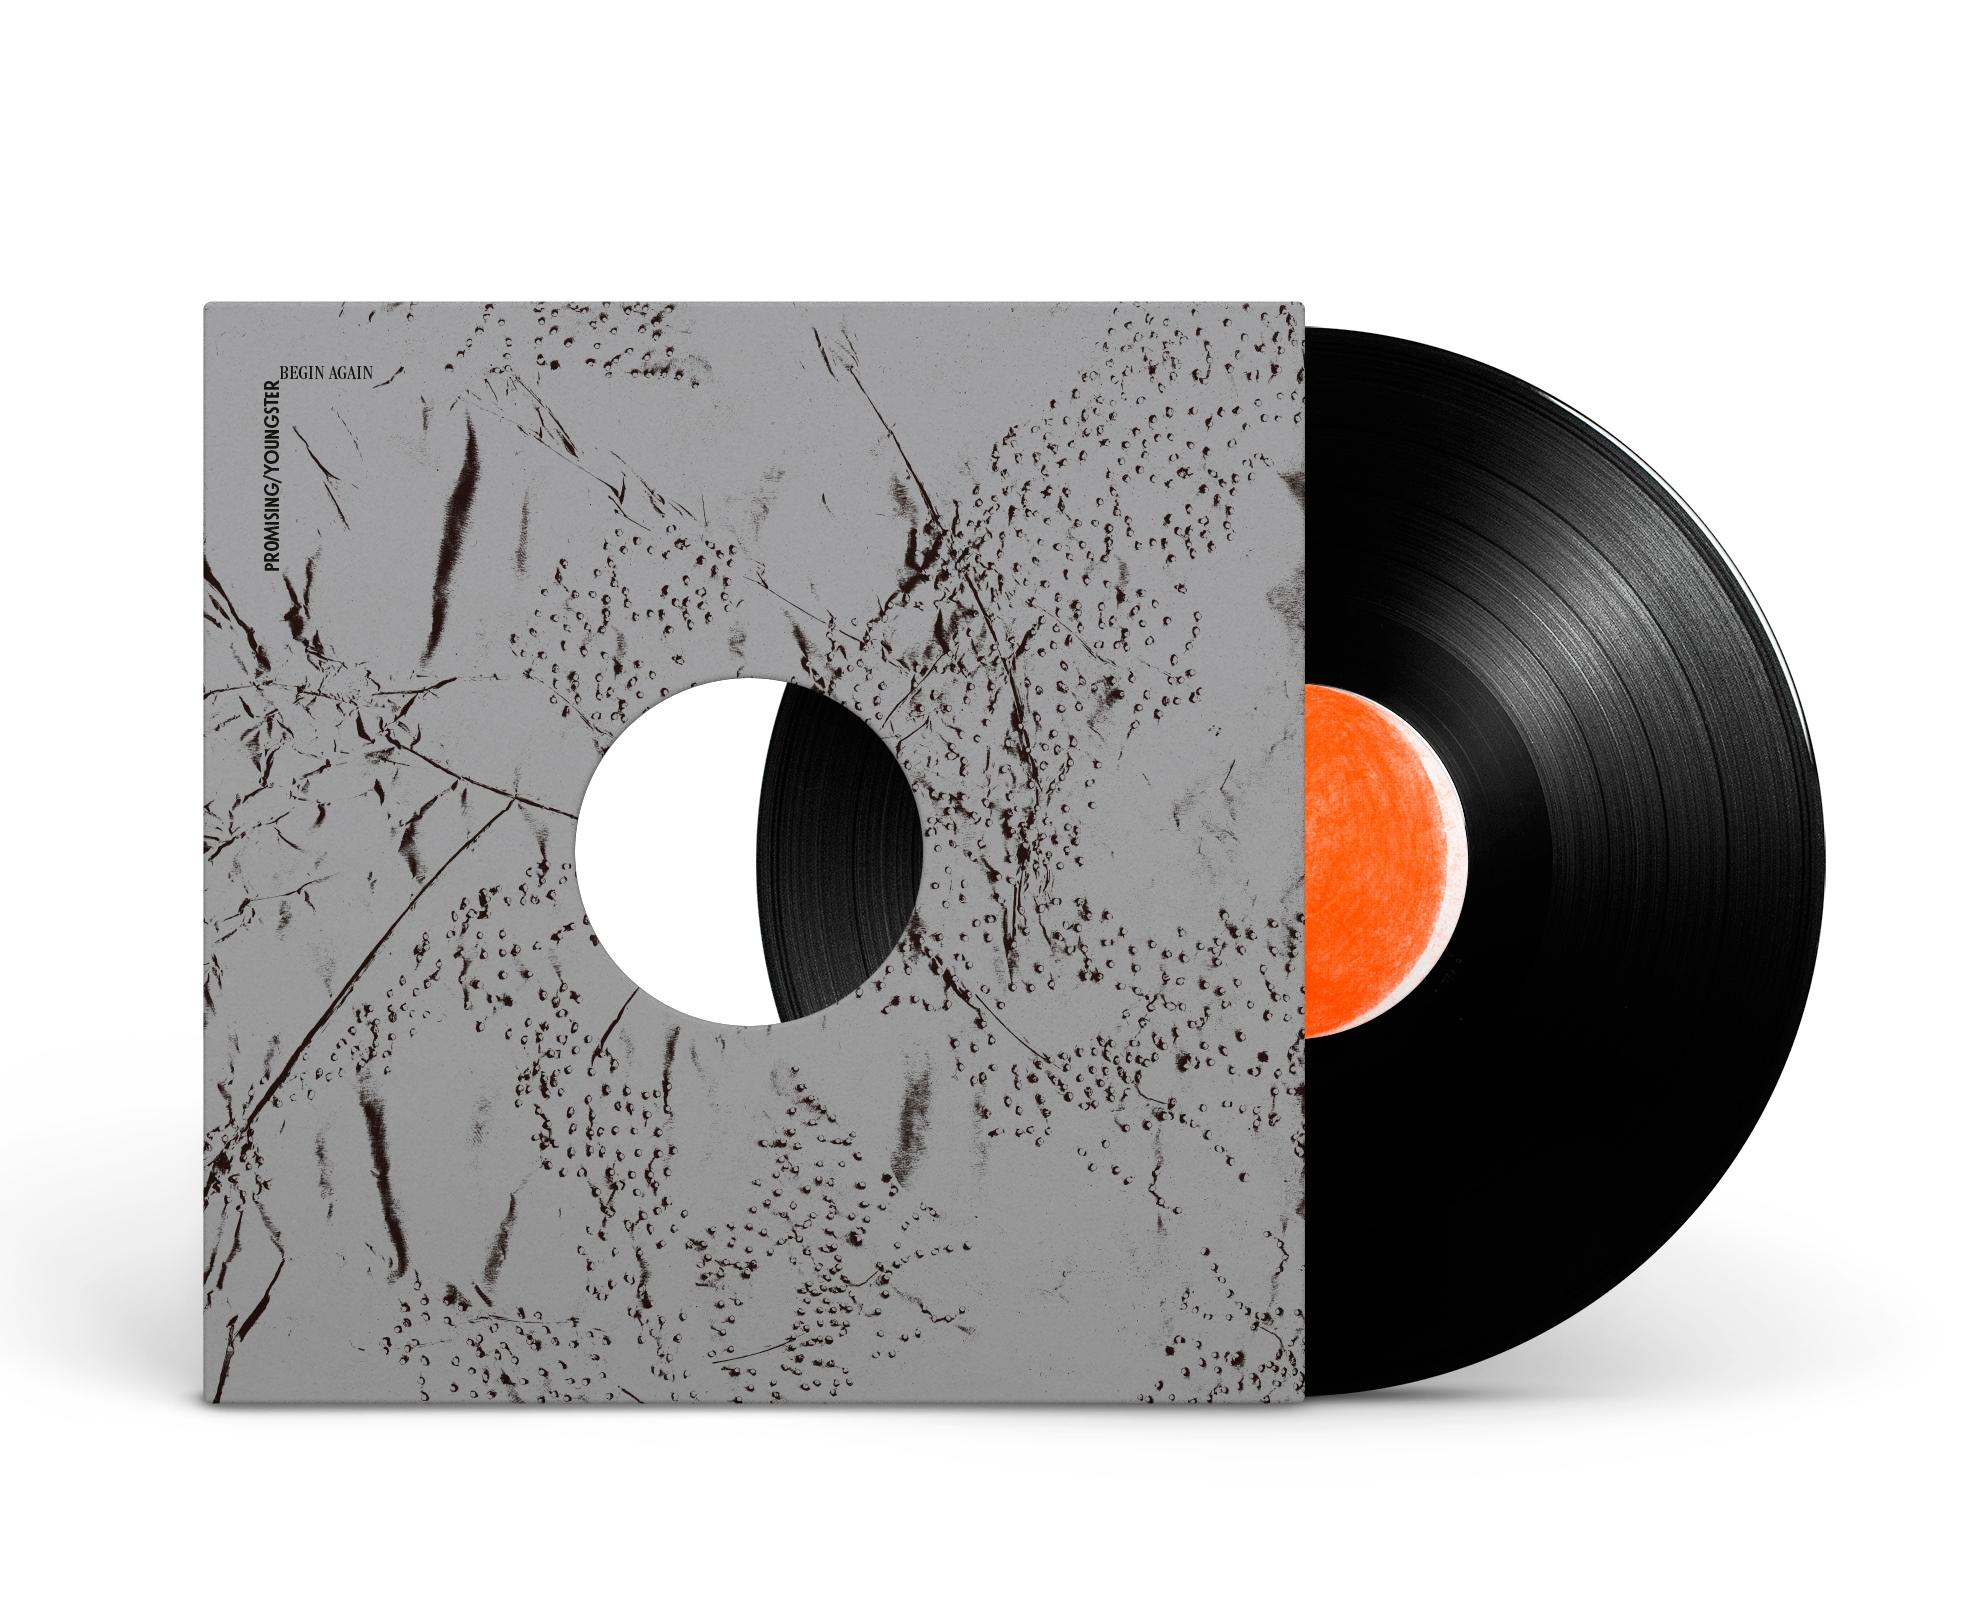 PromisingYoungster_vinyl_artwork_front.jpg